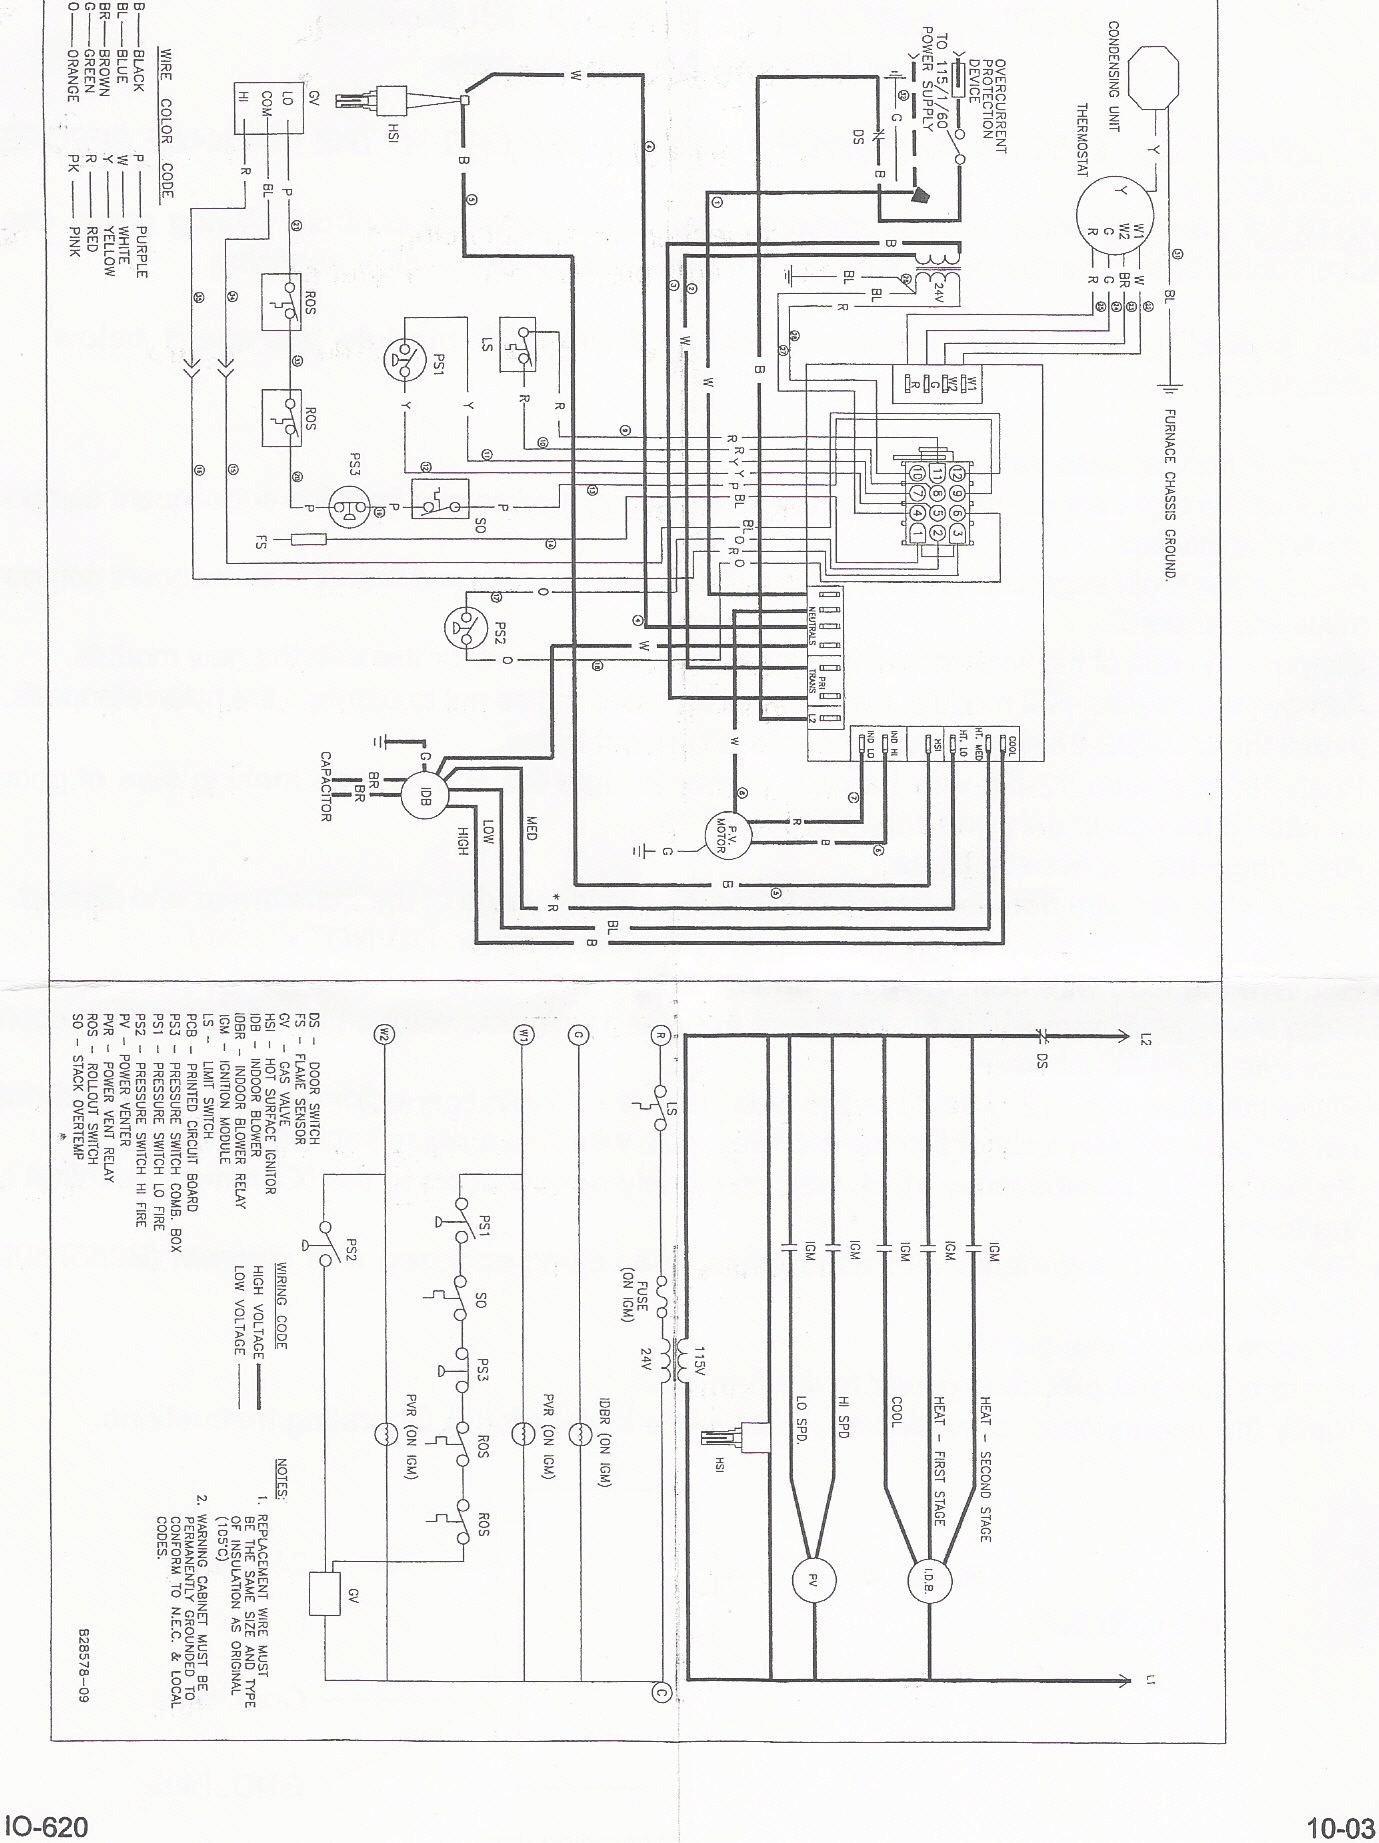 Goodman Ac Wiring Unique | Wiring Diagram Image